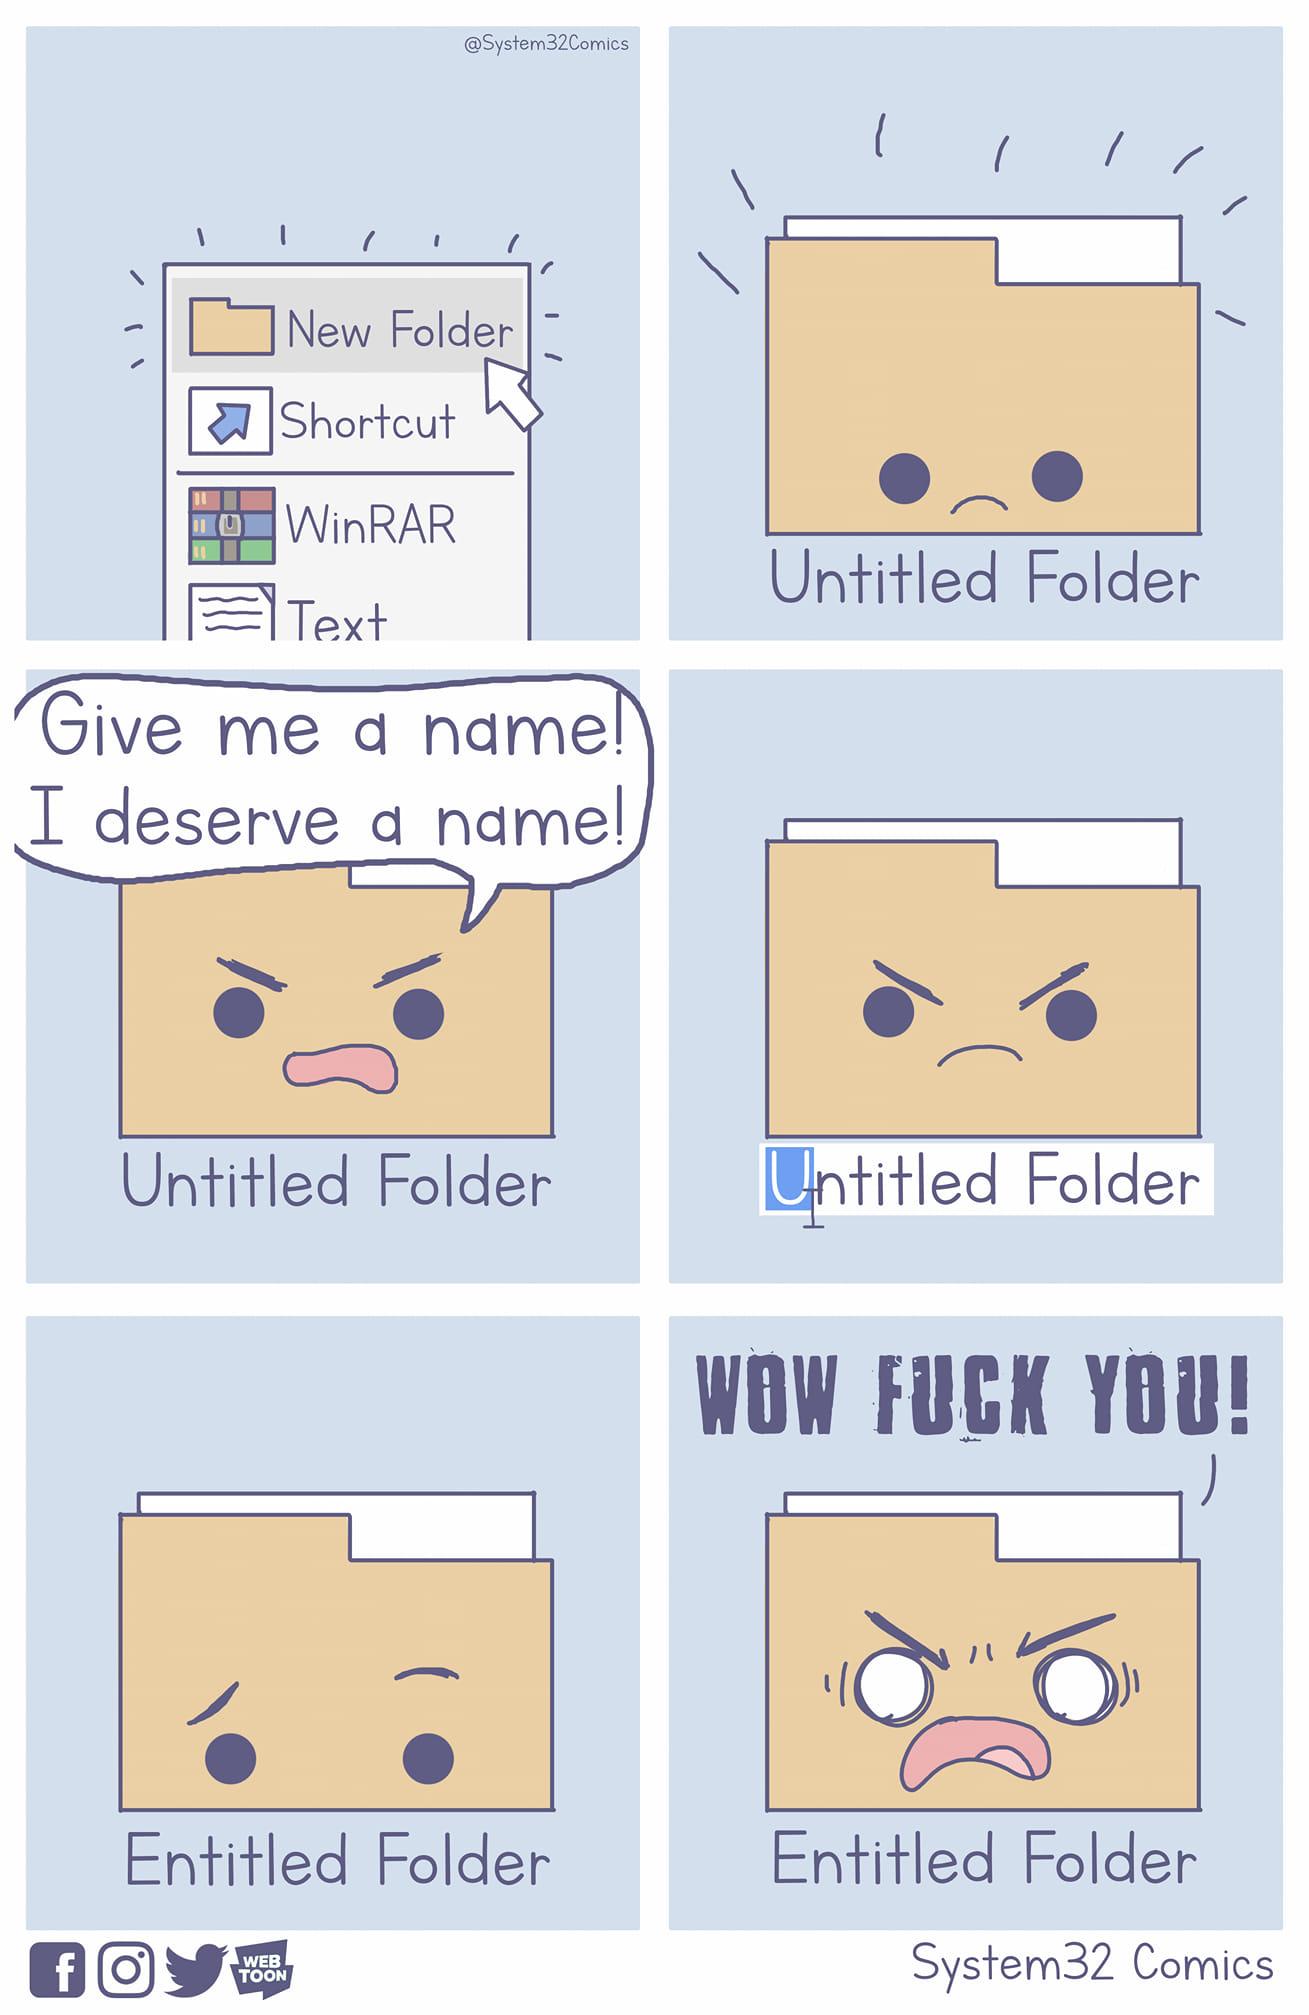 Untitled Folder